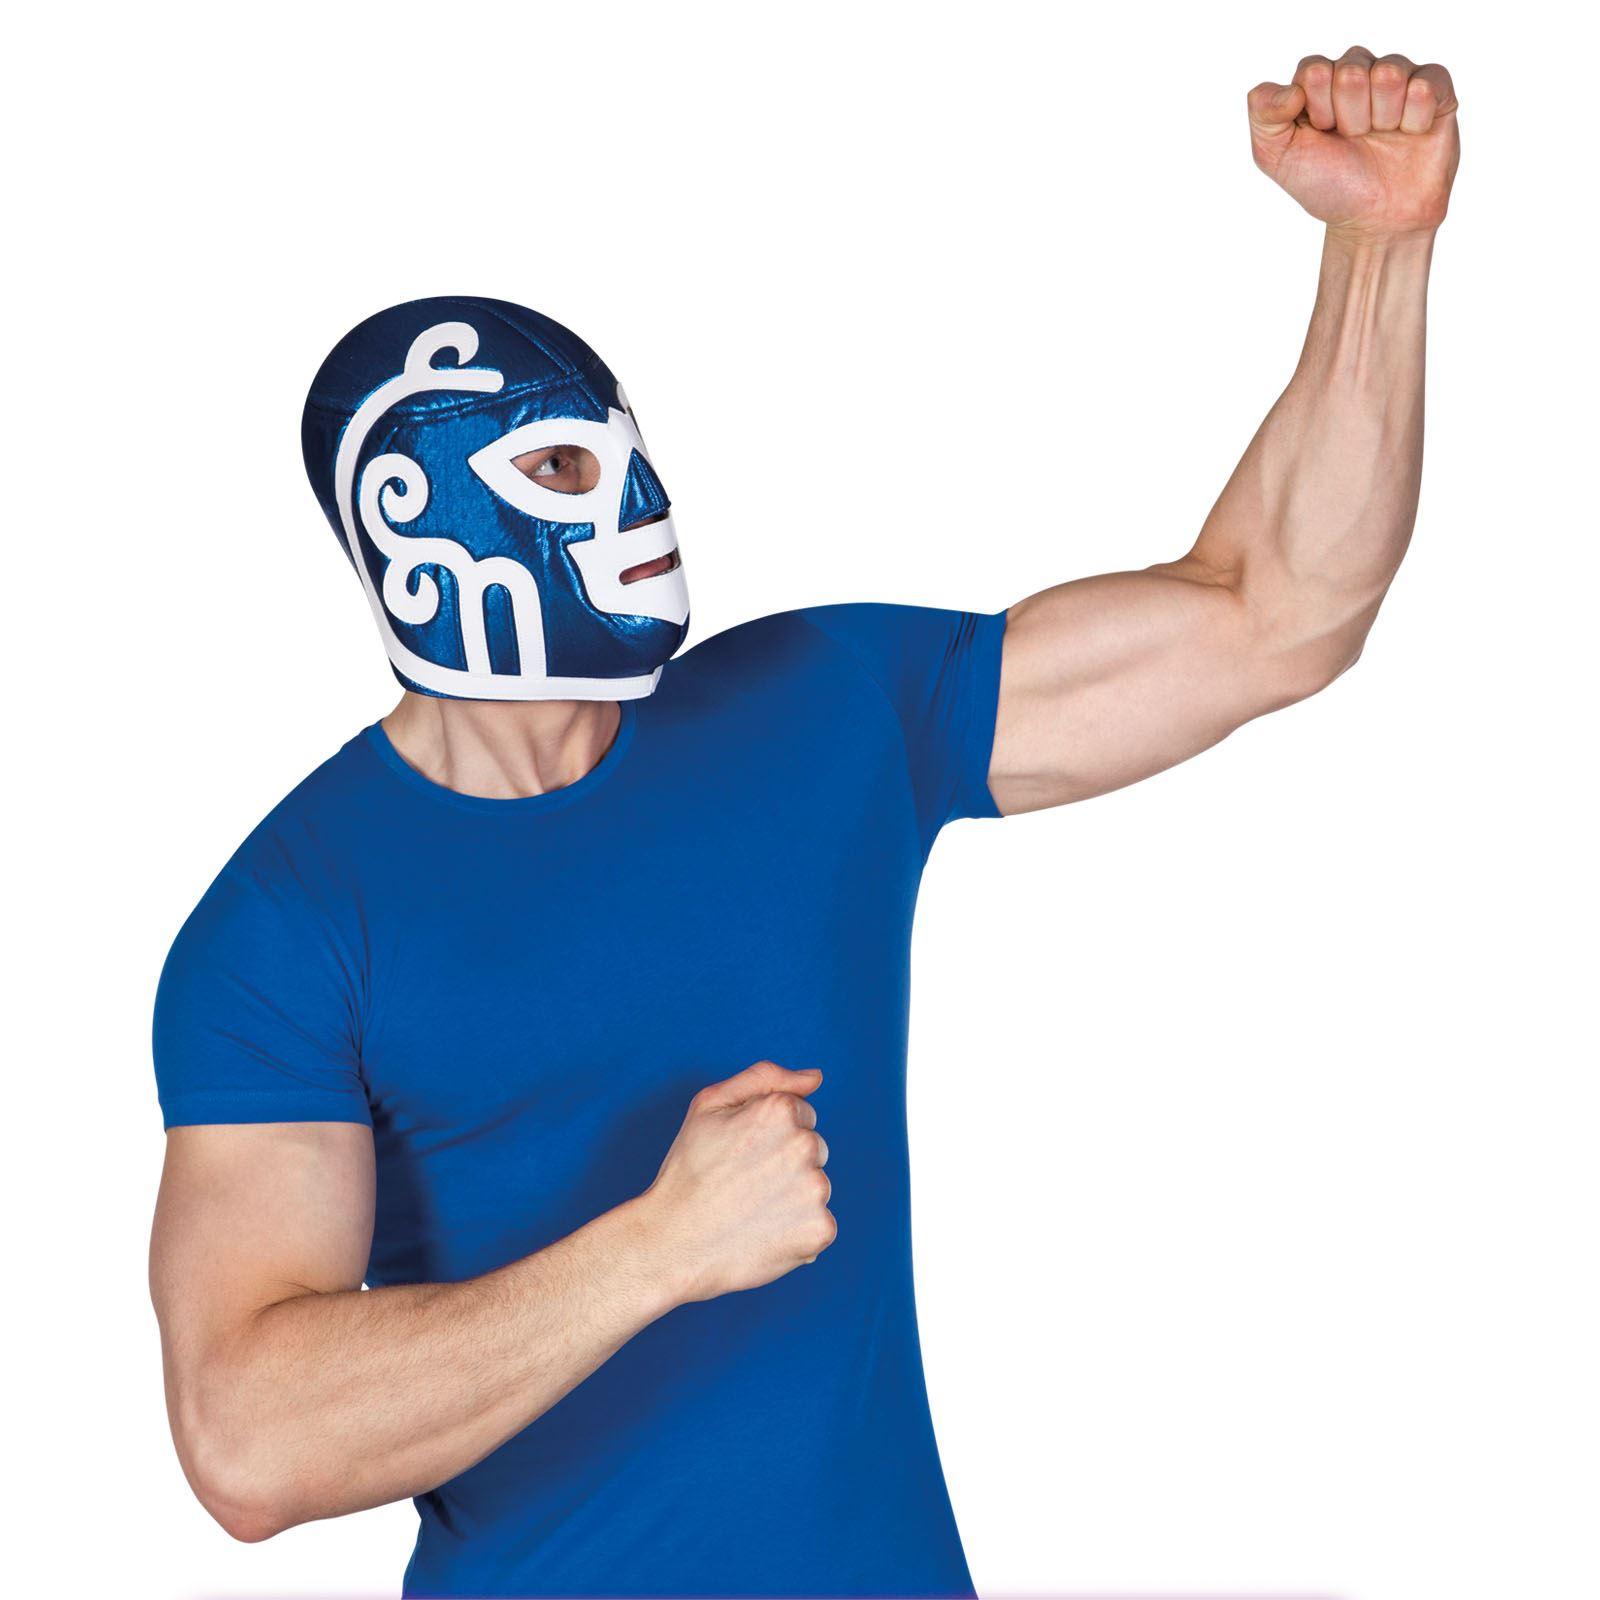 Adult-Mens-Mexican-Wrestler-Wrestling-Mask-WWE-Libre-Fight-Fancy-Dress-Accessory miniatuur 4